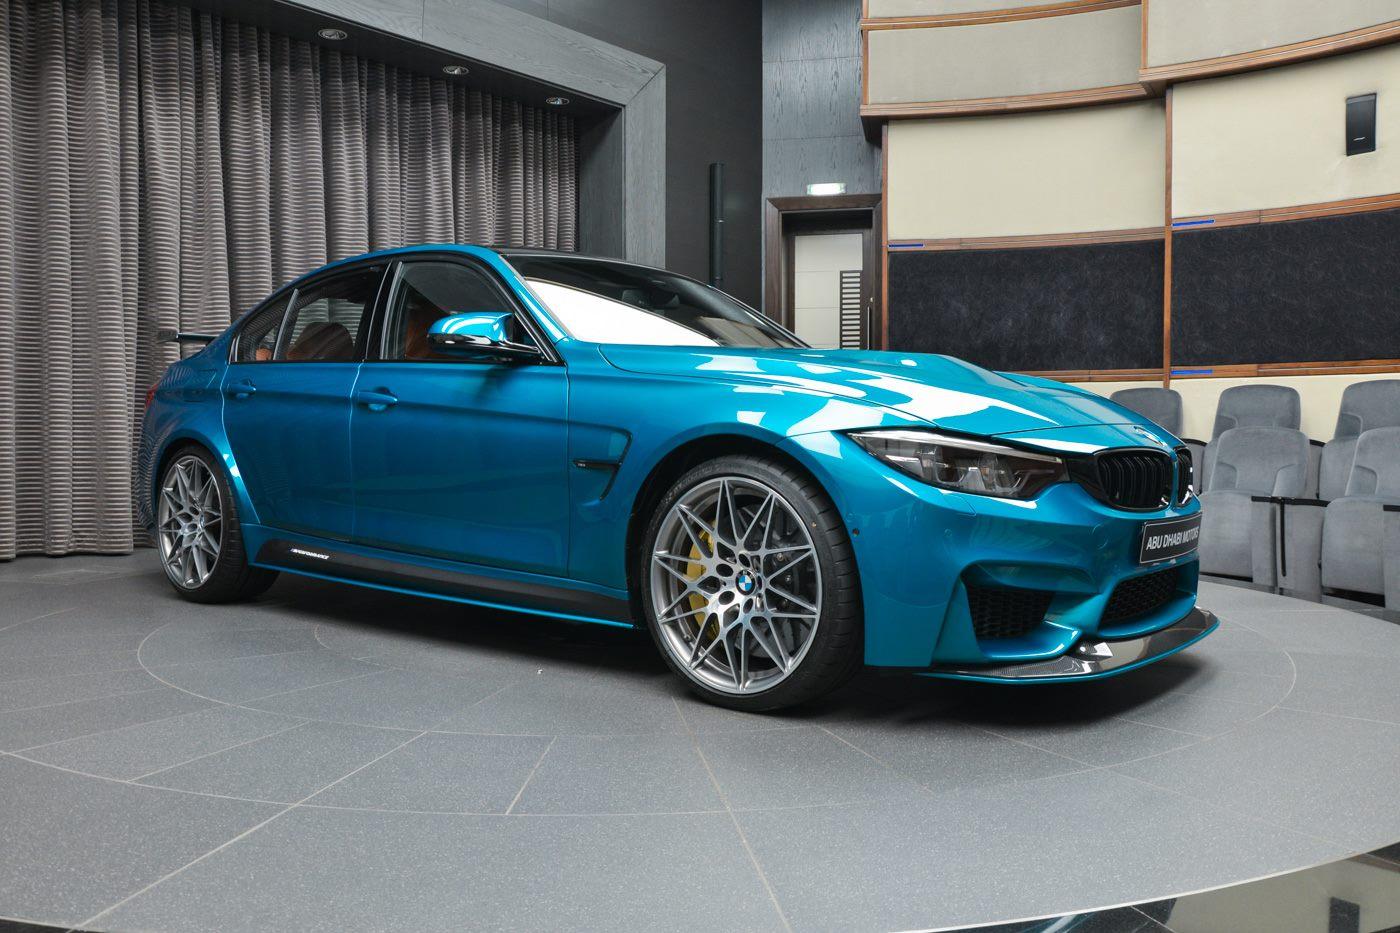 Wallpaper Amazing Convertible Cars Atlantis Blue Bmw M3 Looks Astonishing With M Performance